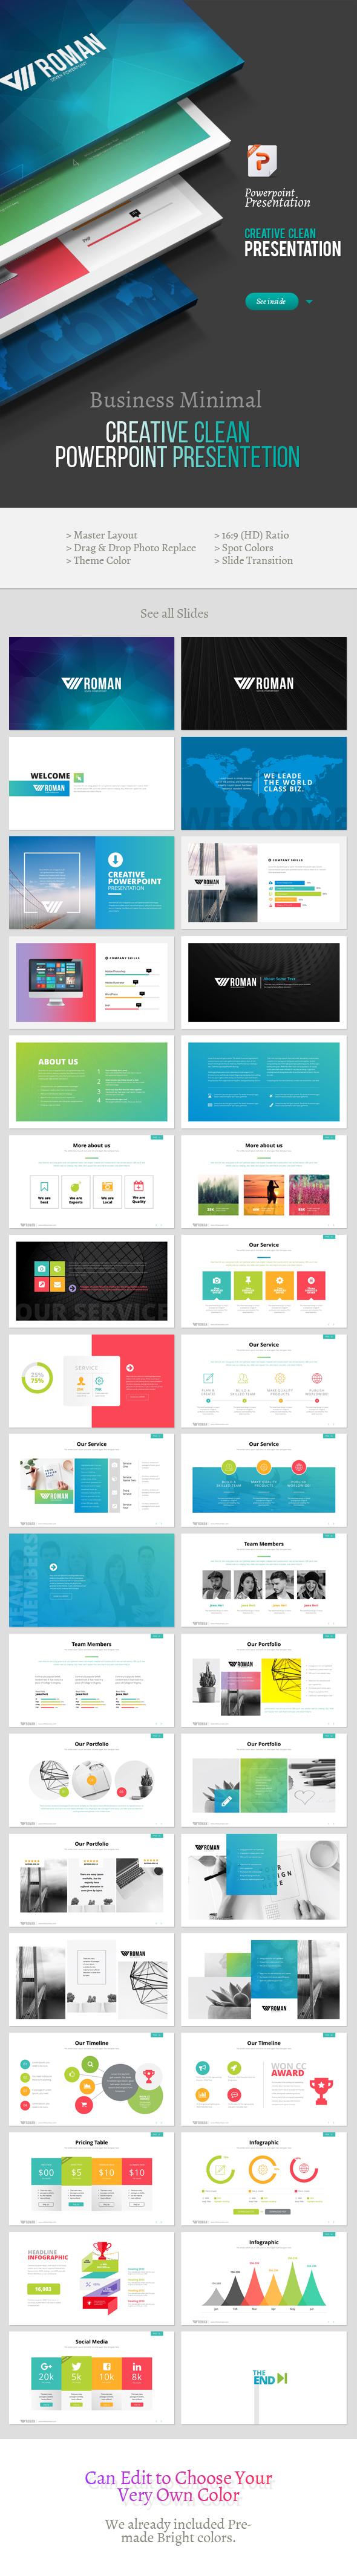 Creative Roman Powerpoint Template - Creative PowerPoint Templates